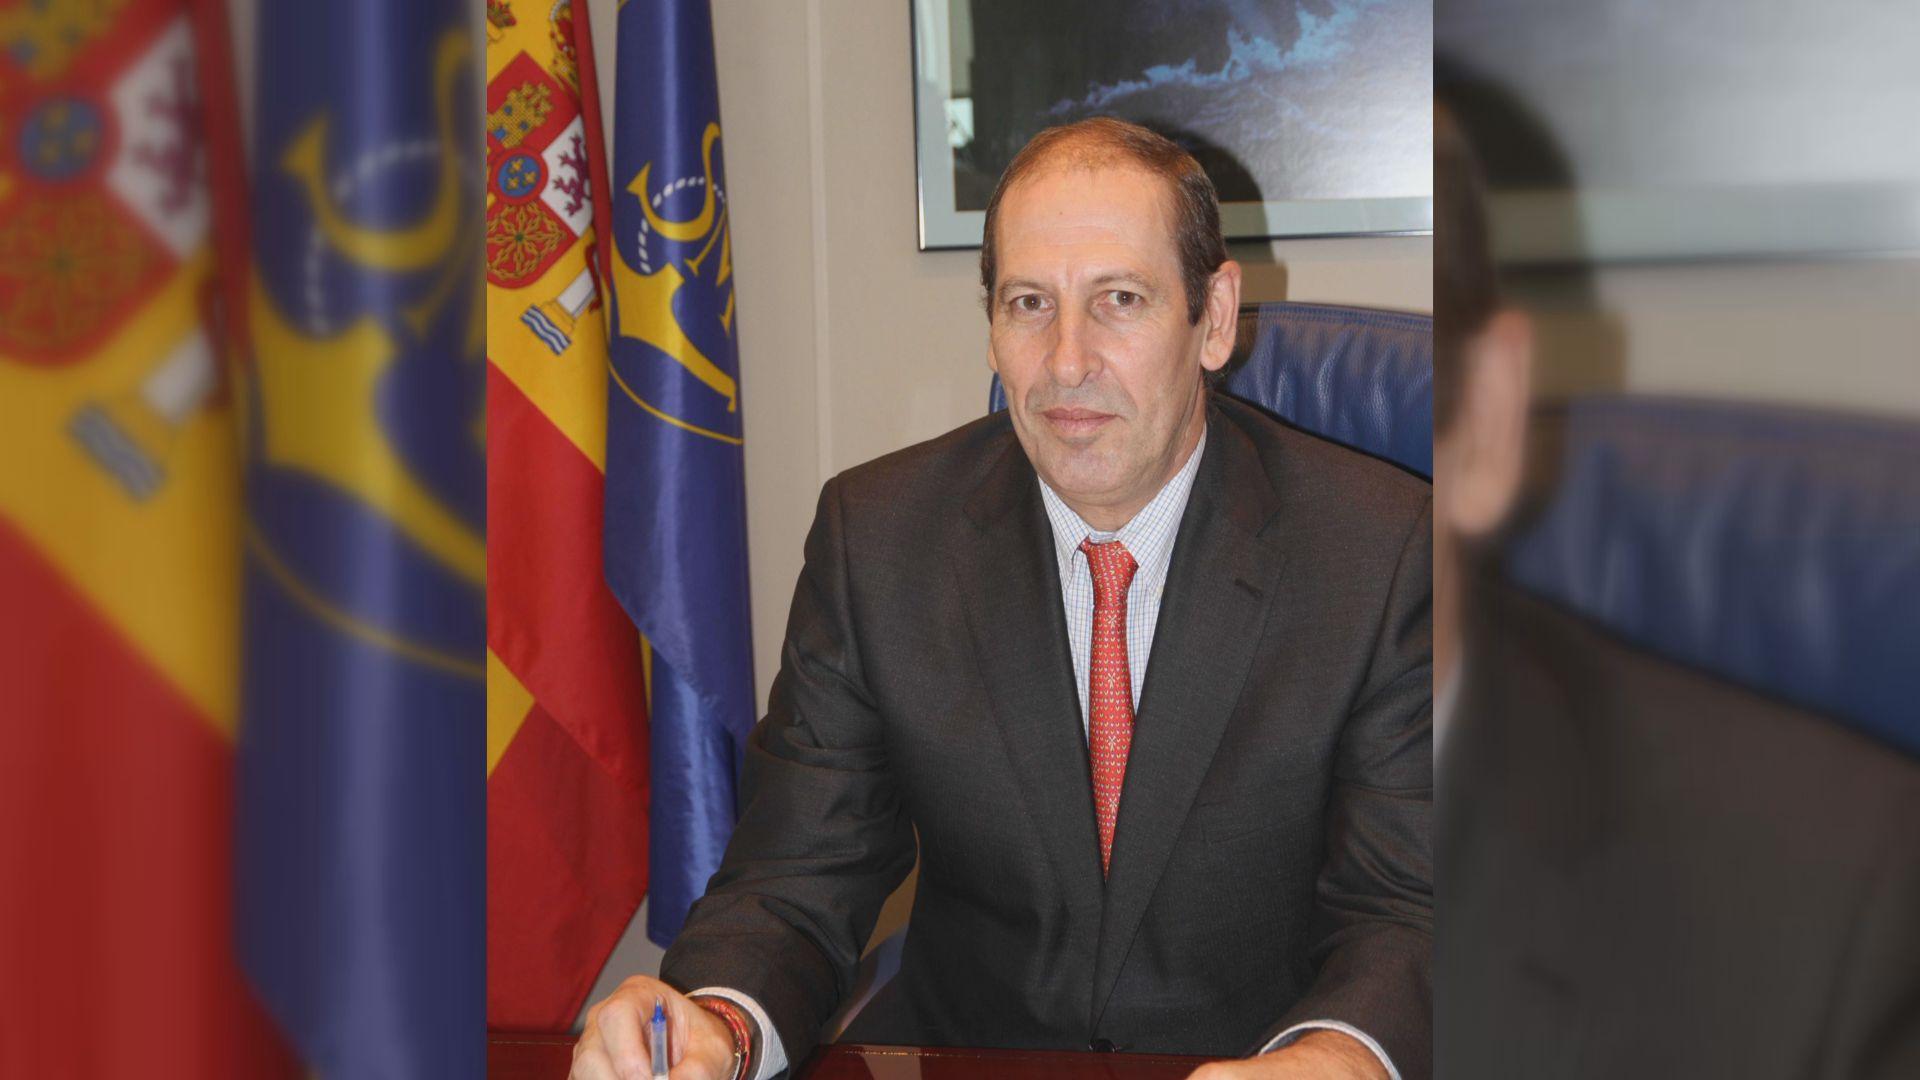 JUAN LUIS PEDROSA (exdirector de Salvamento Marítimo) - tiene un patrimonio de 1.246.833 euros